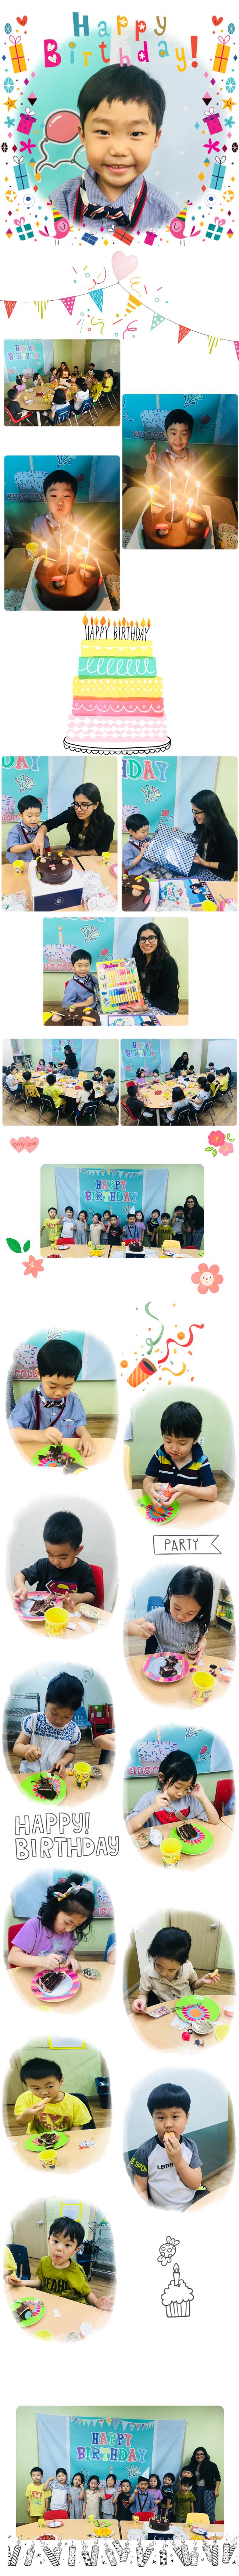 birthday_June_1.jpg